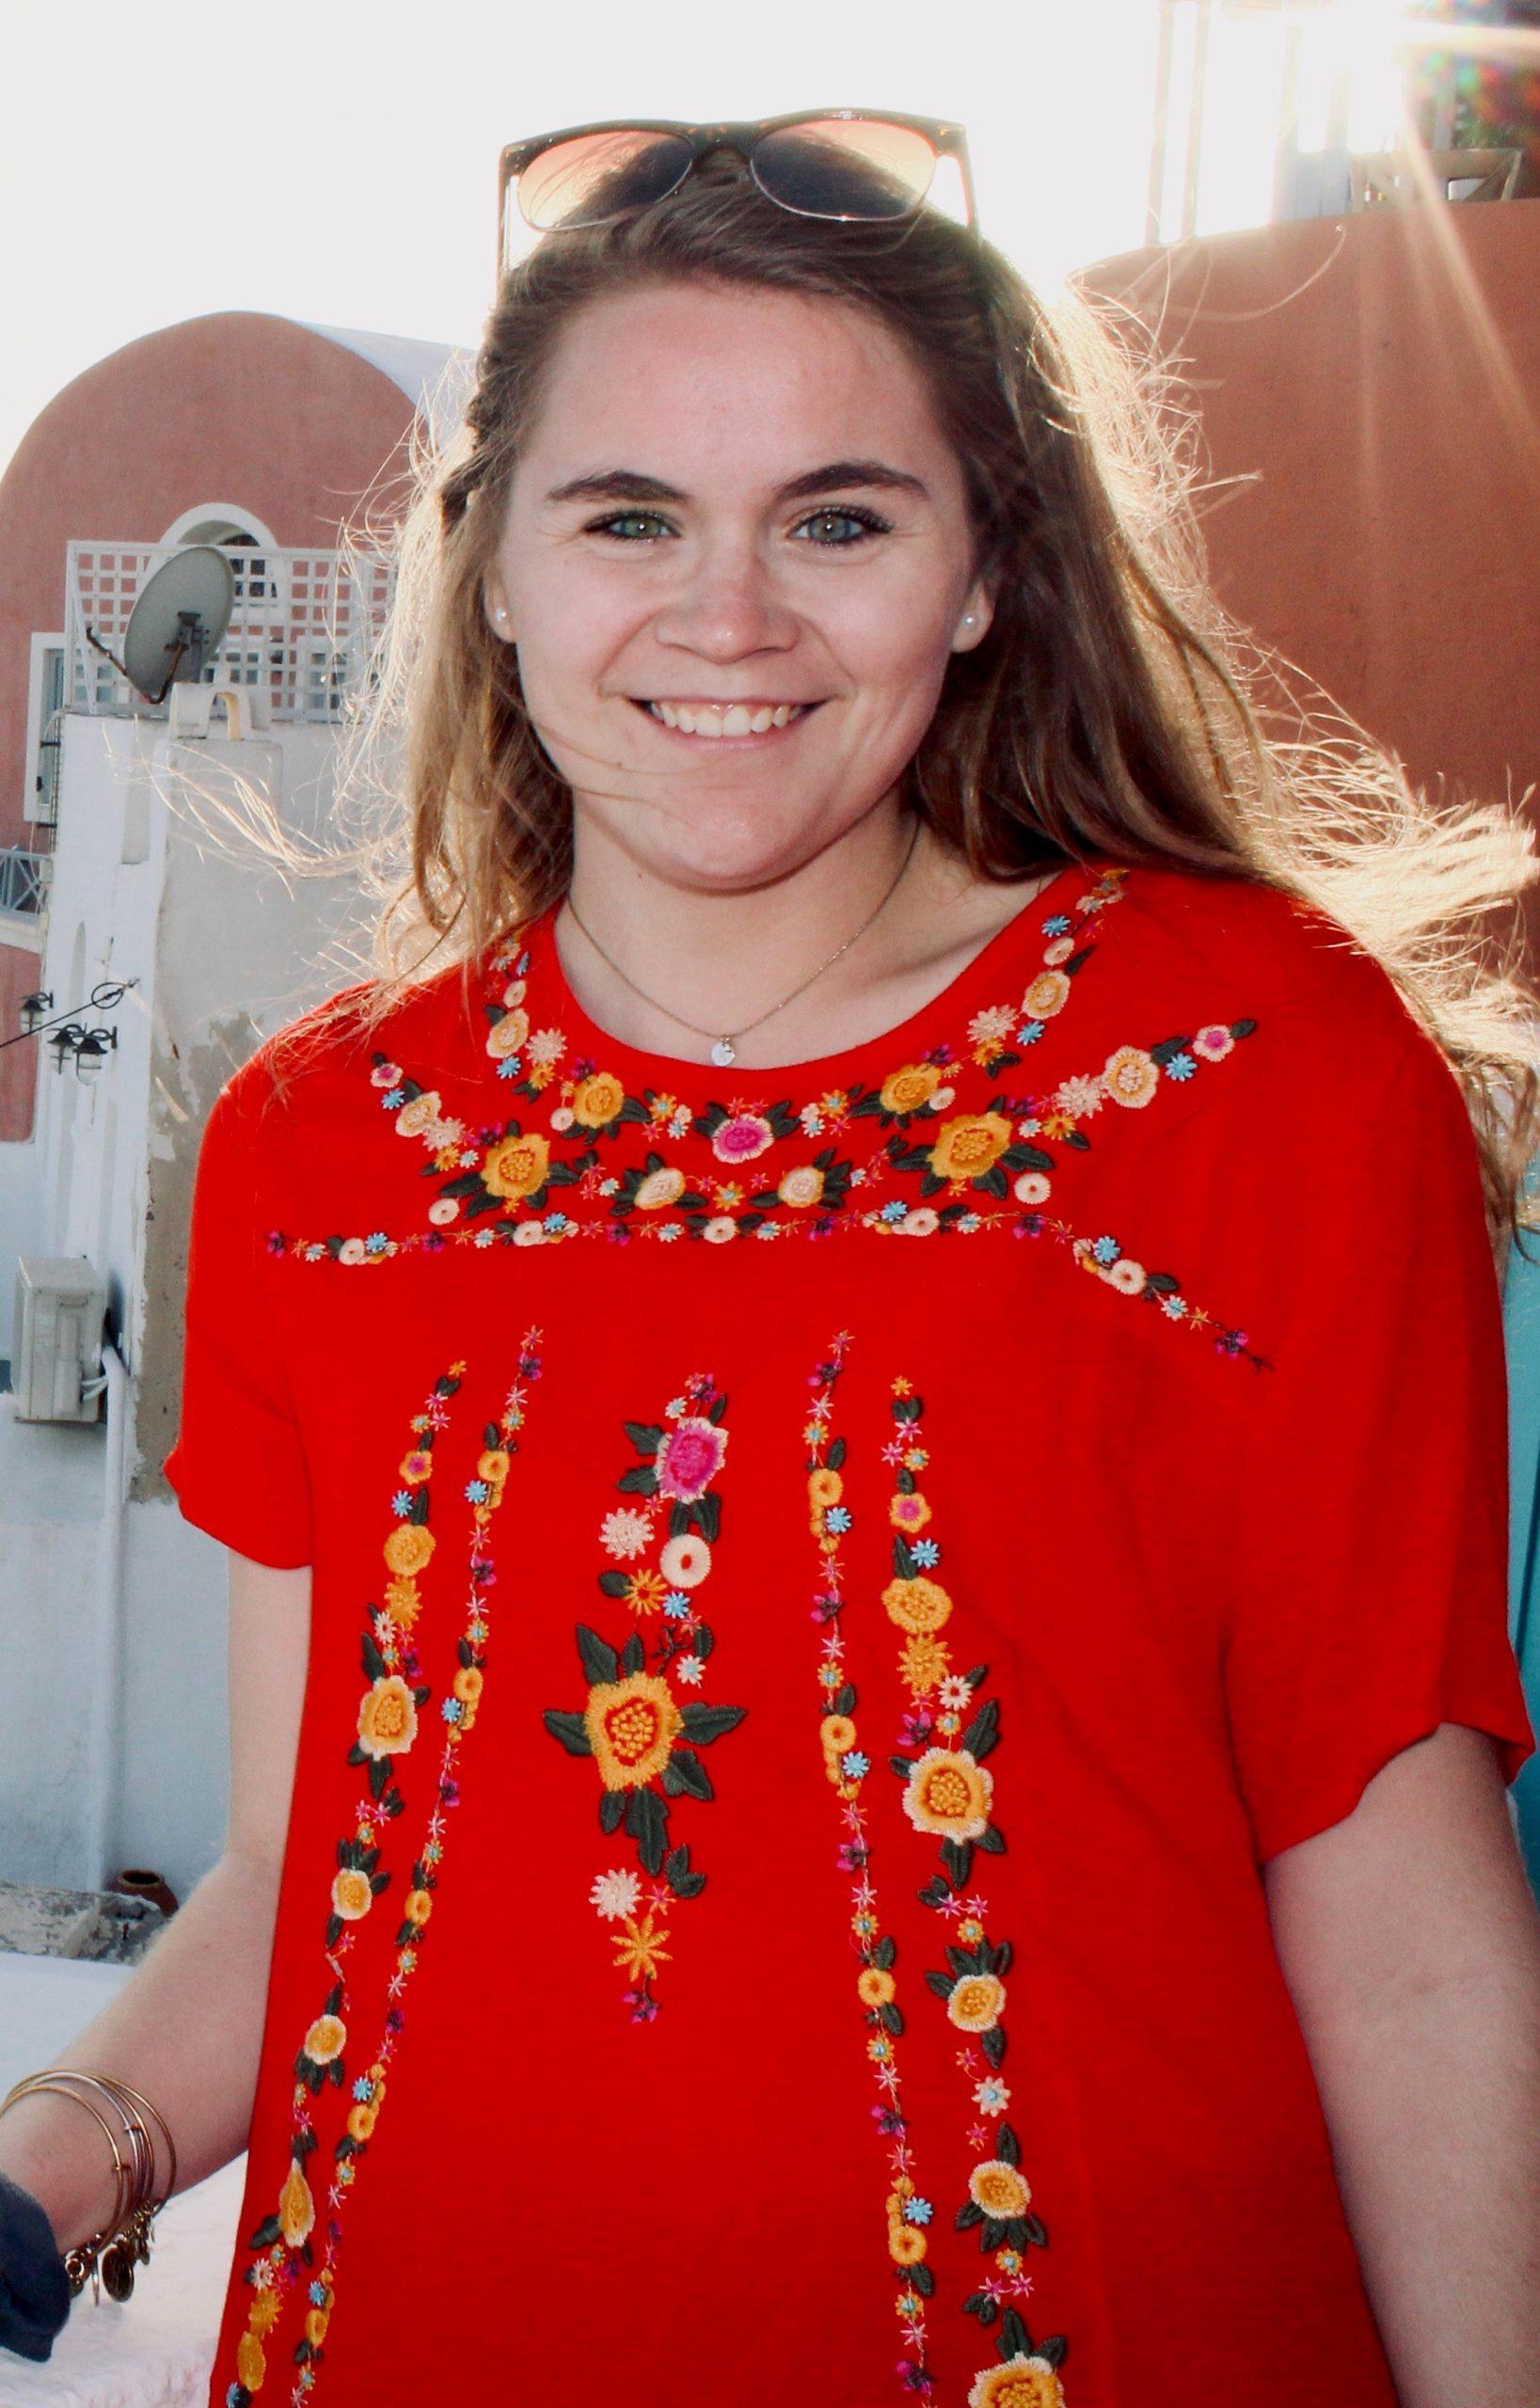 2020 US Army Women's Foundation 2020 Scholarship Recipient Katherine French